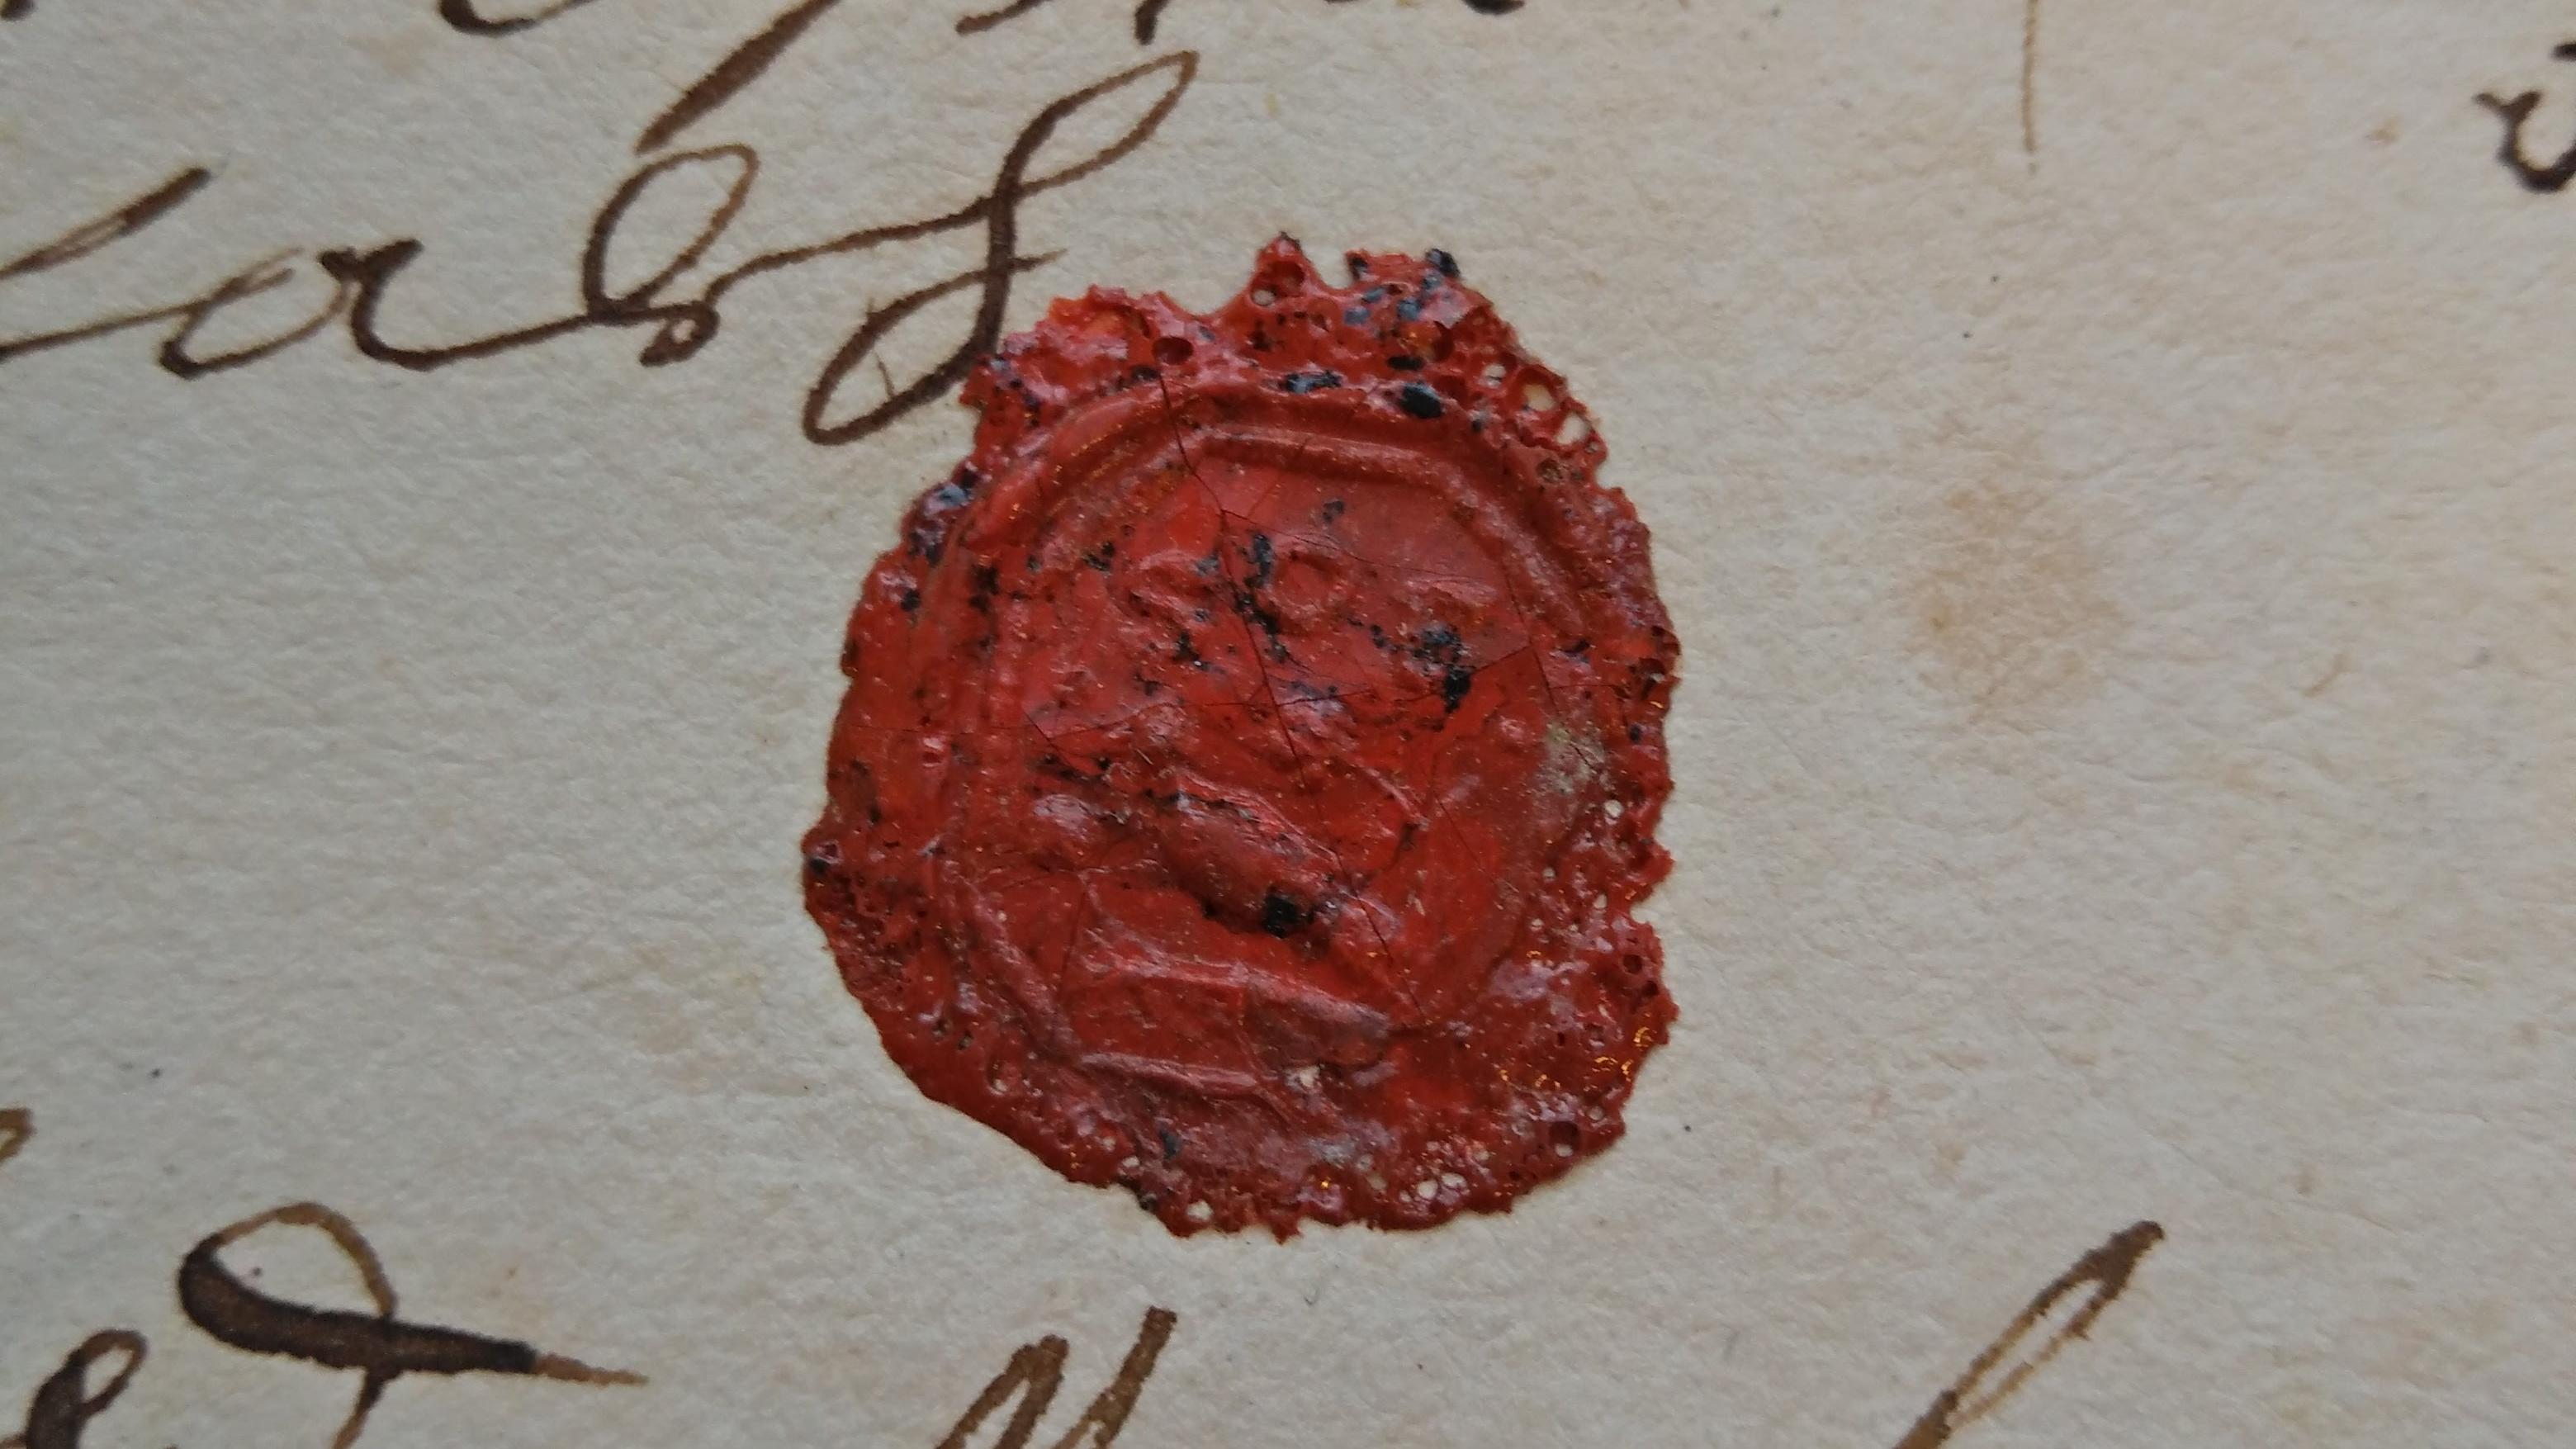 naerbillede-segl-1708.jpg